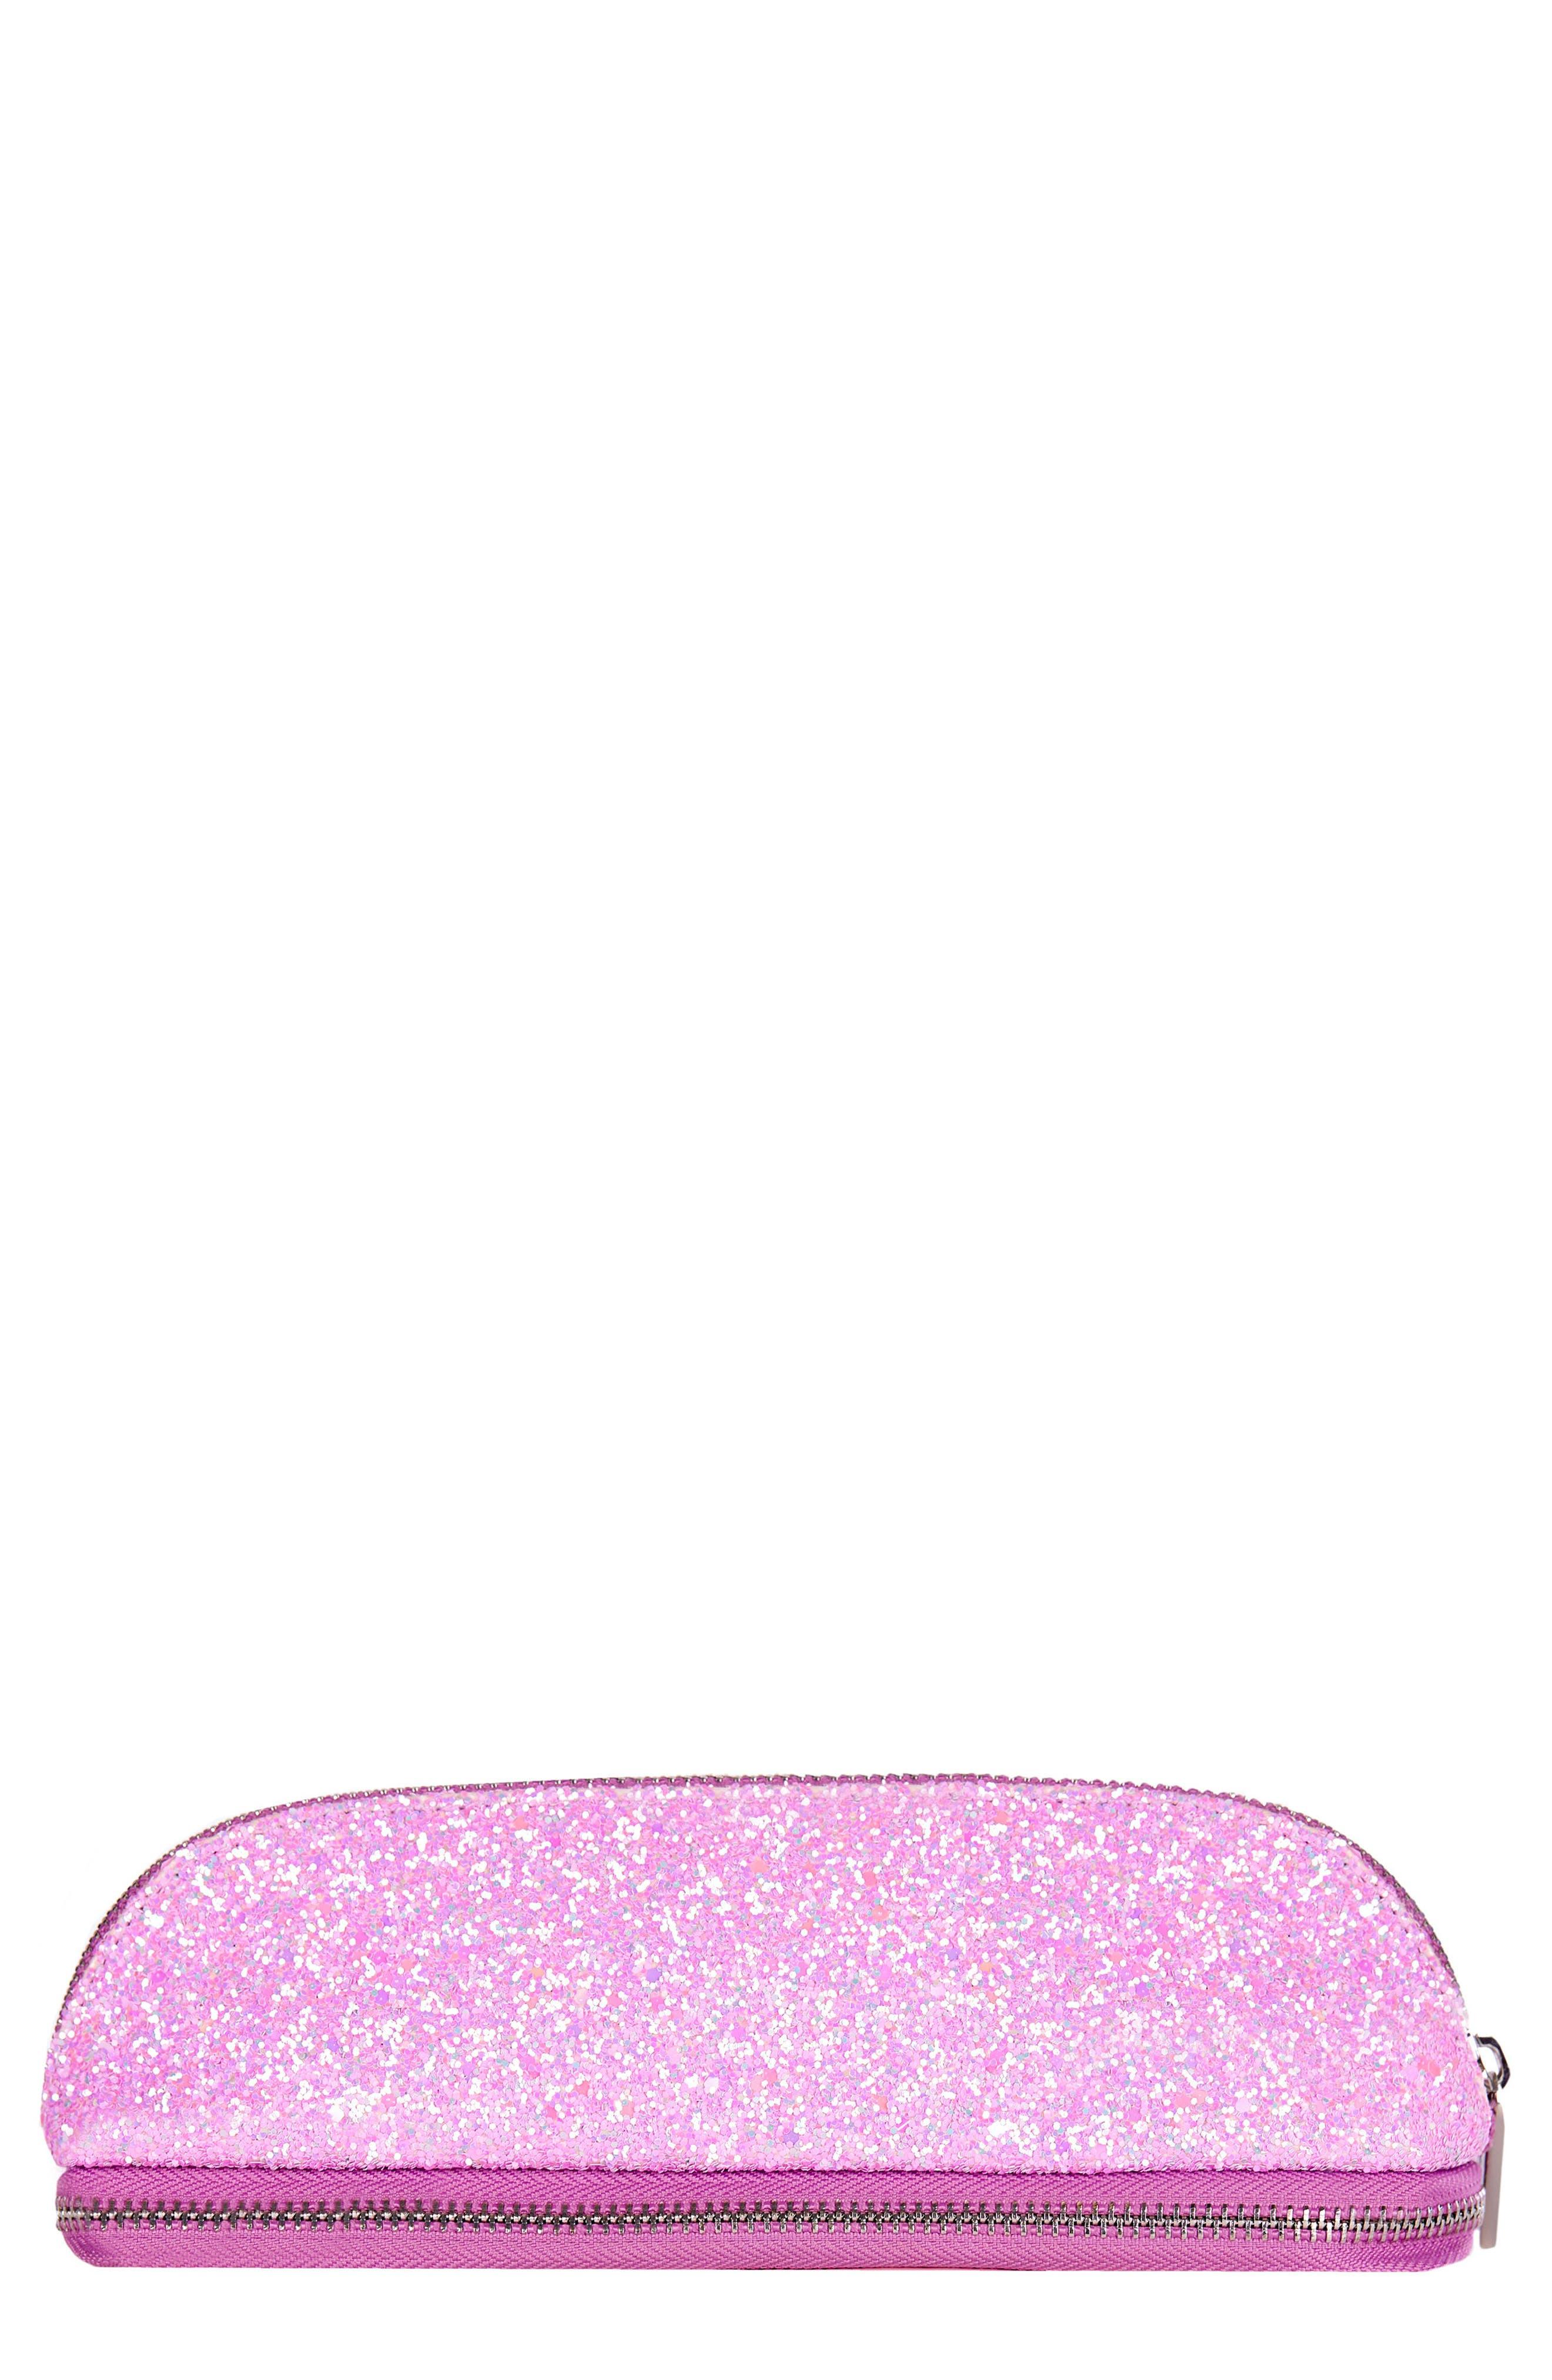 Glitsy Pink Makeup Brush Cosmetics Case,                             Main thumbnail 1, color,                             NO COLOR